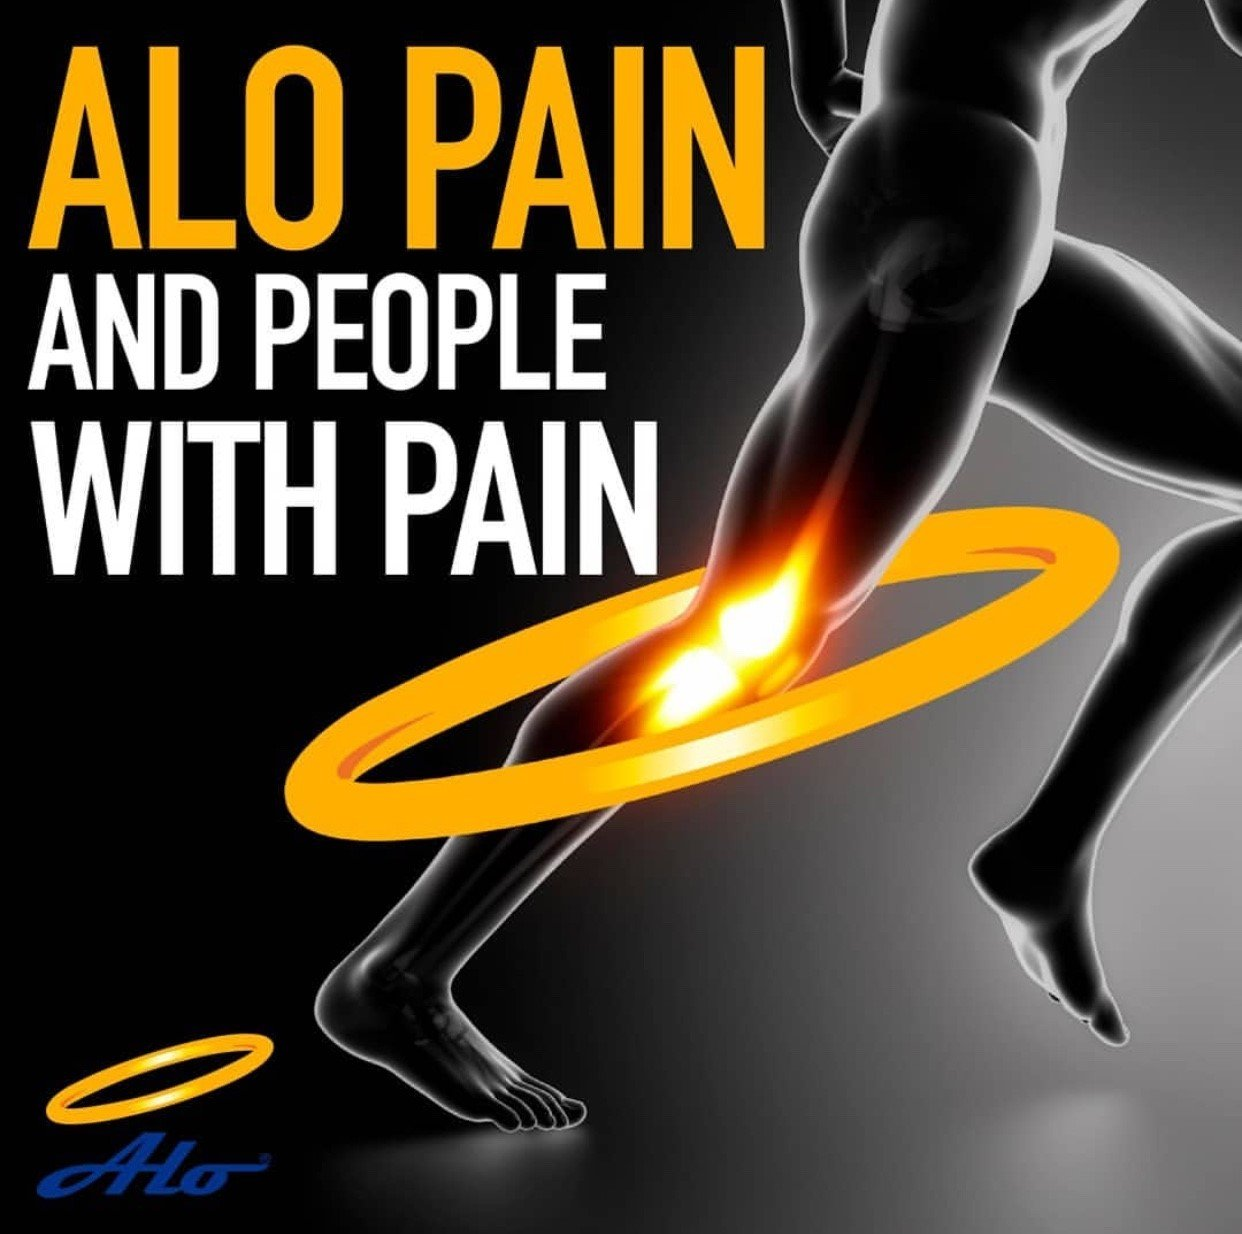 Alo Sadece 22 50 Lagangadelbusca Fal3610018m Circuit Breaker Square D Amazoncom Pain Relief Cream 32oz With Pump For Arthritis Sore